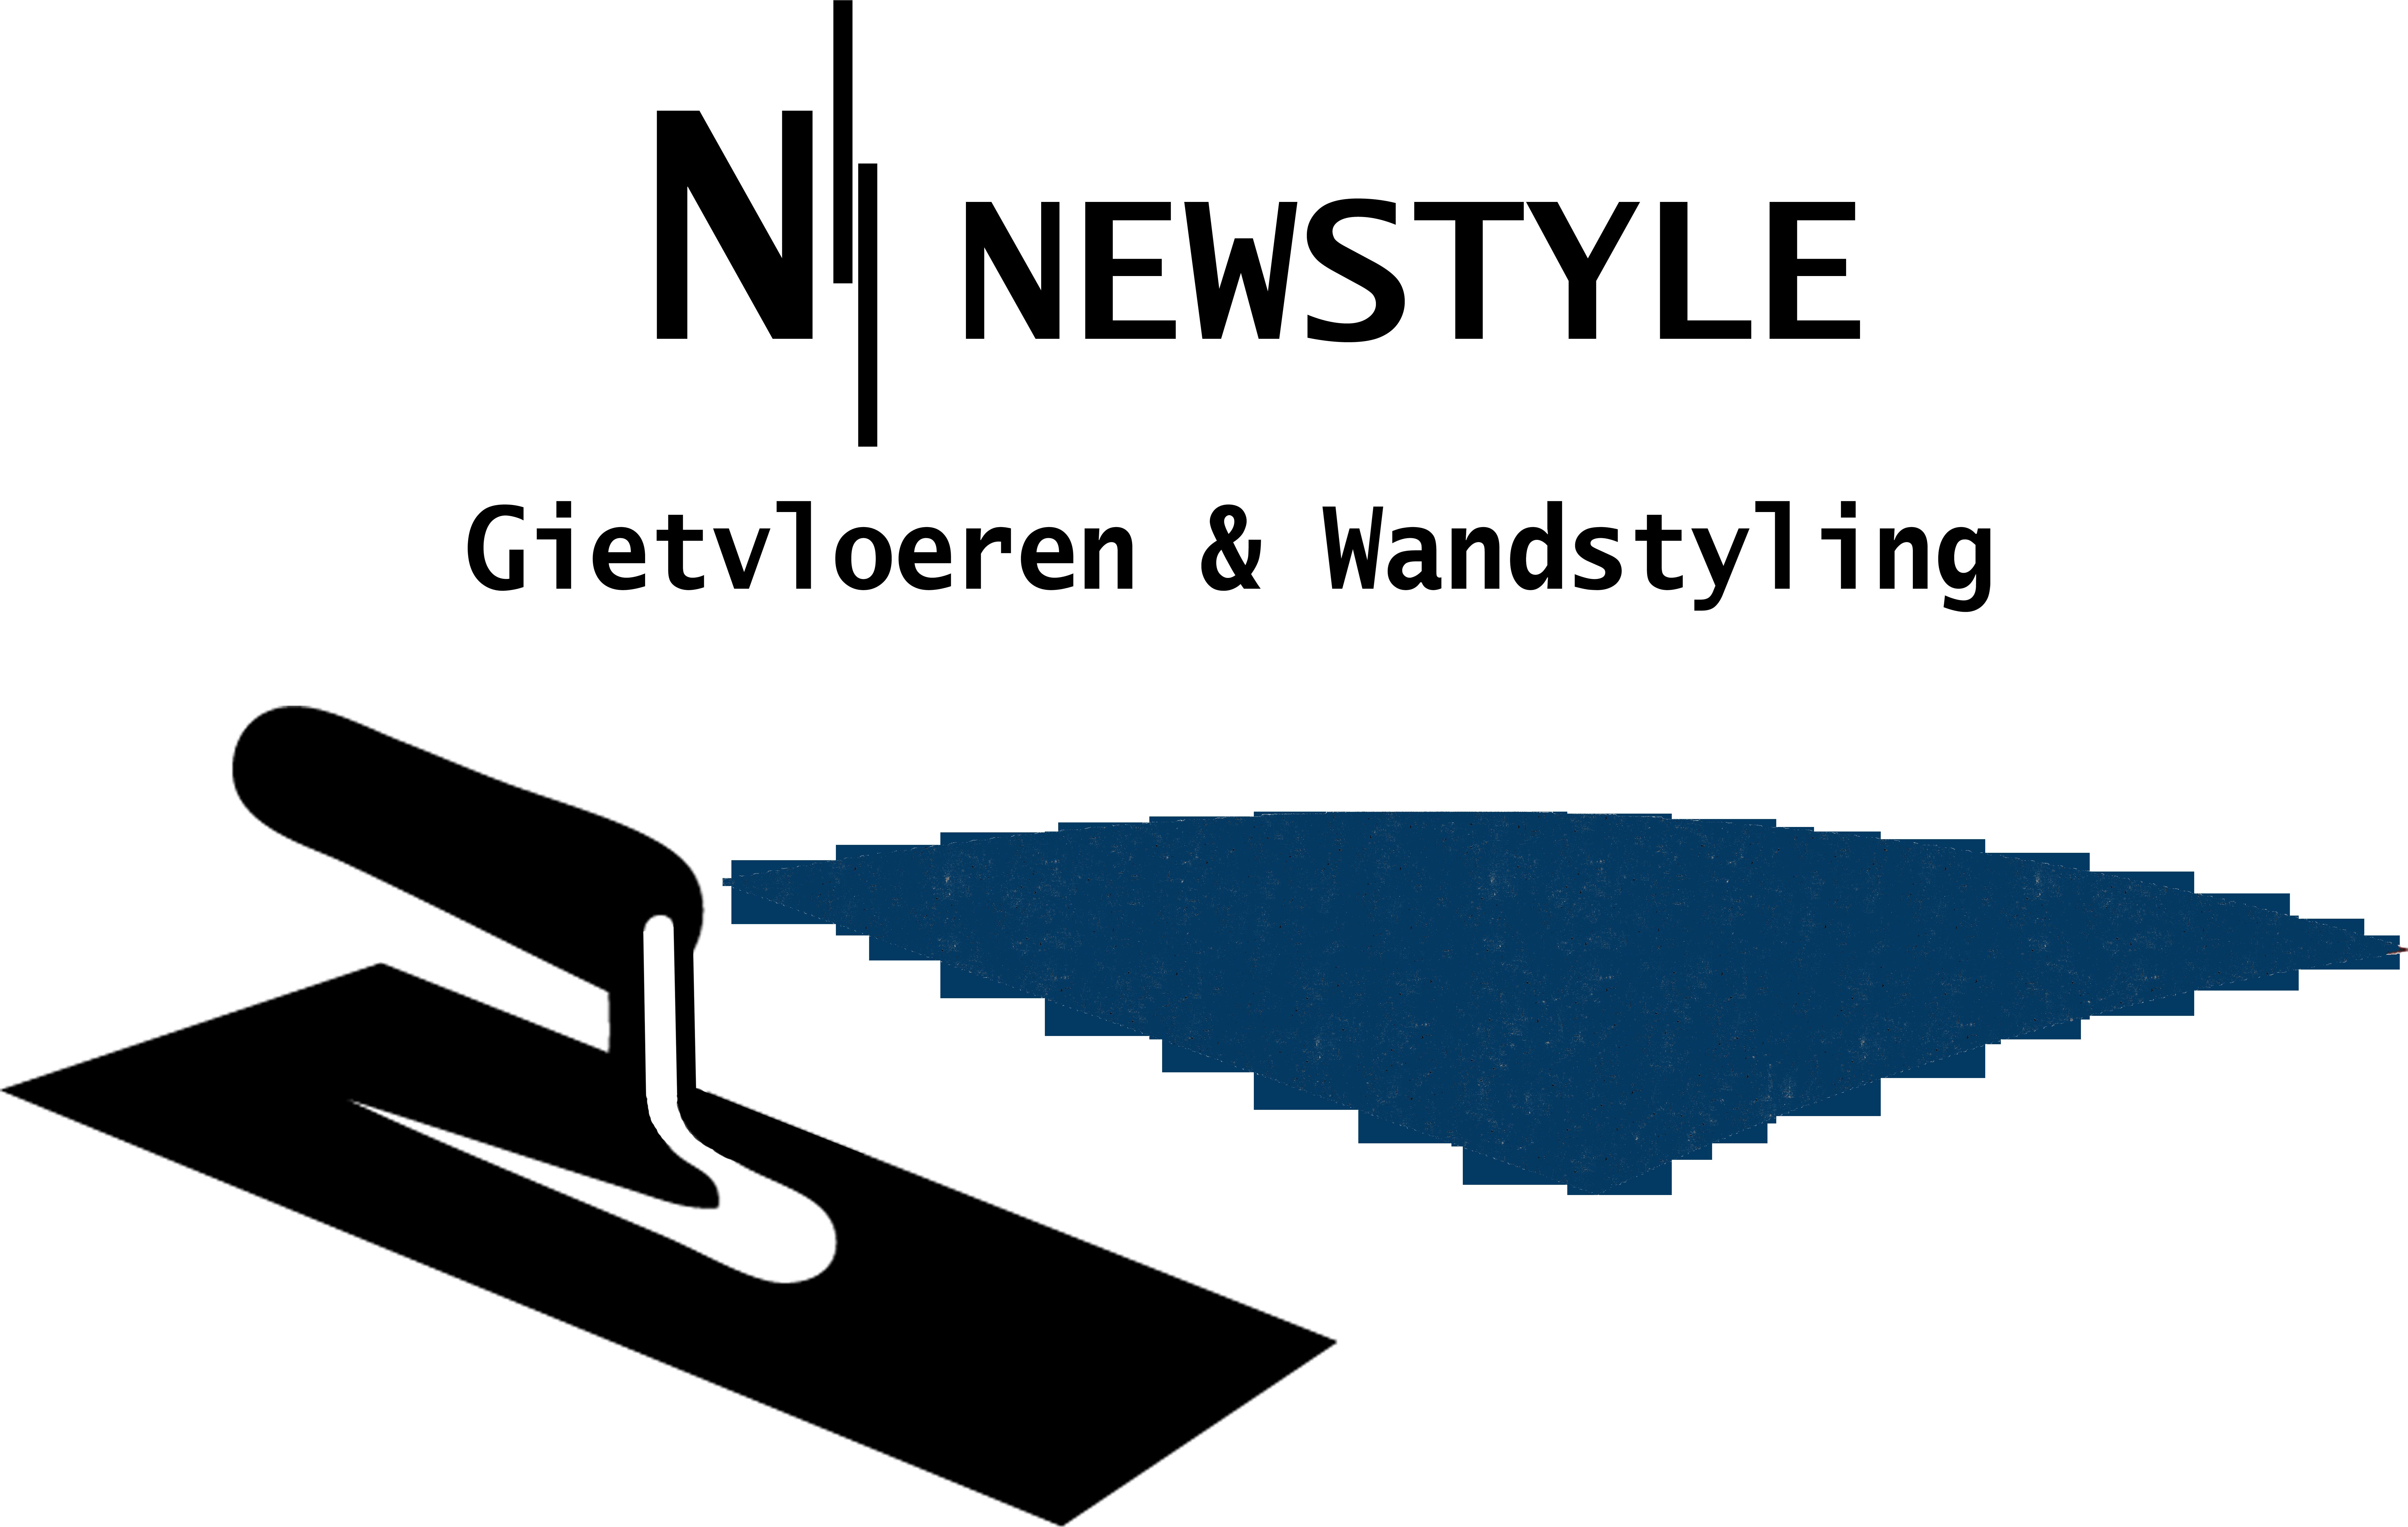 Newstyle Gietvloeren & Wandstyling